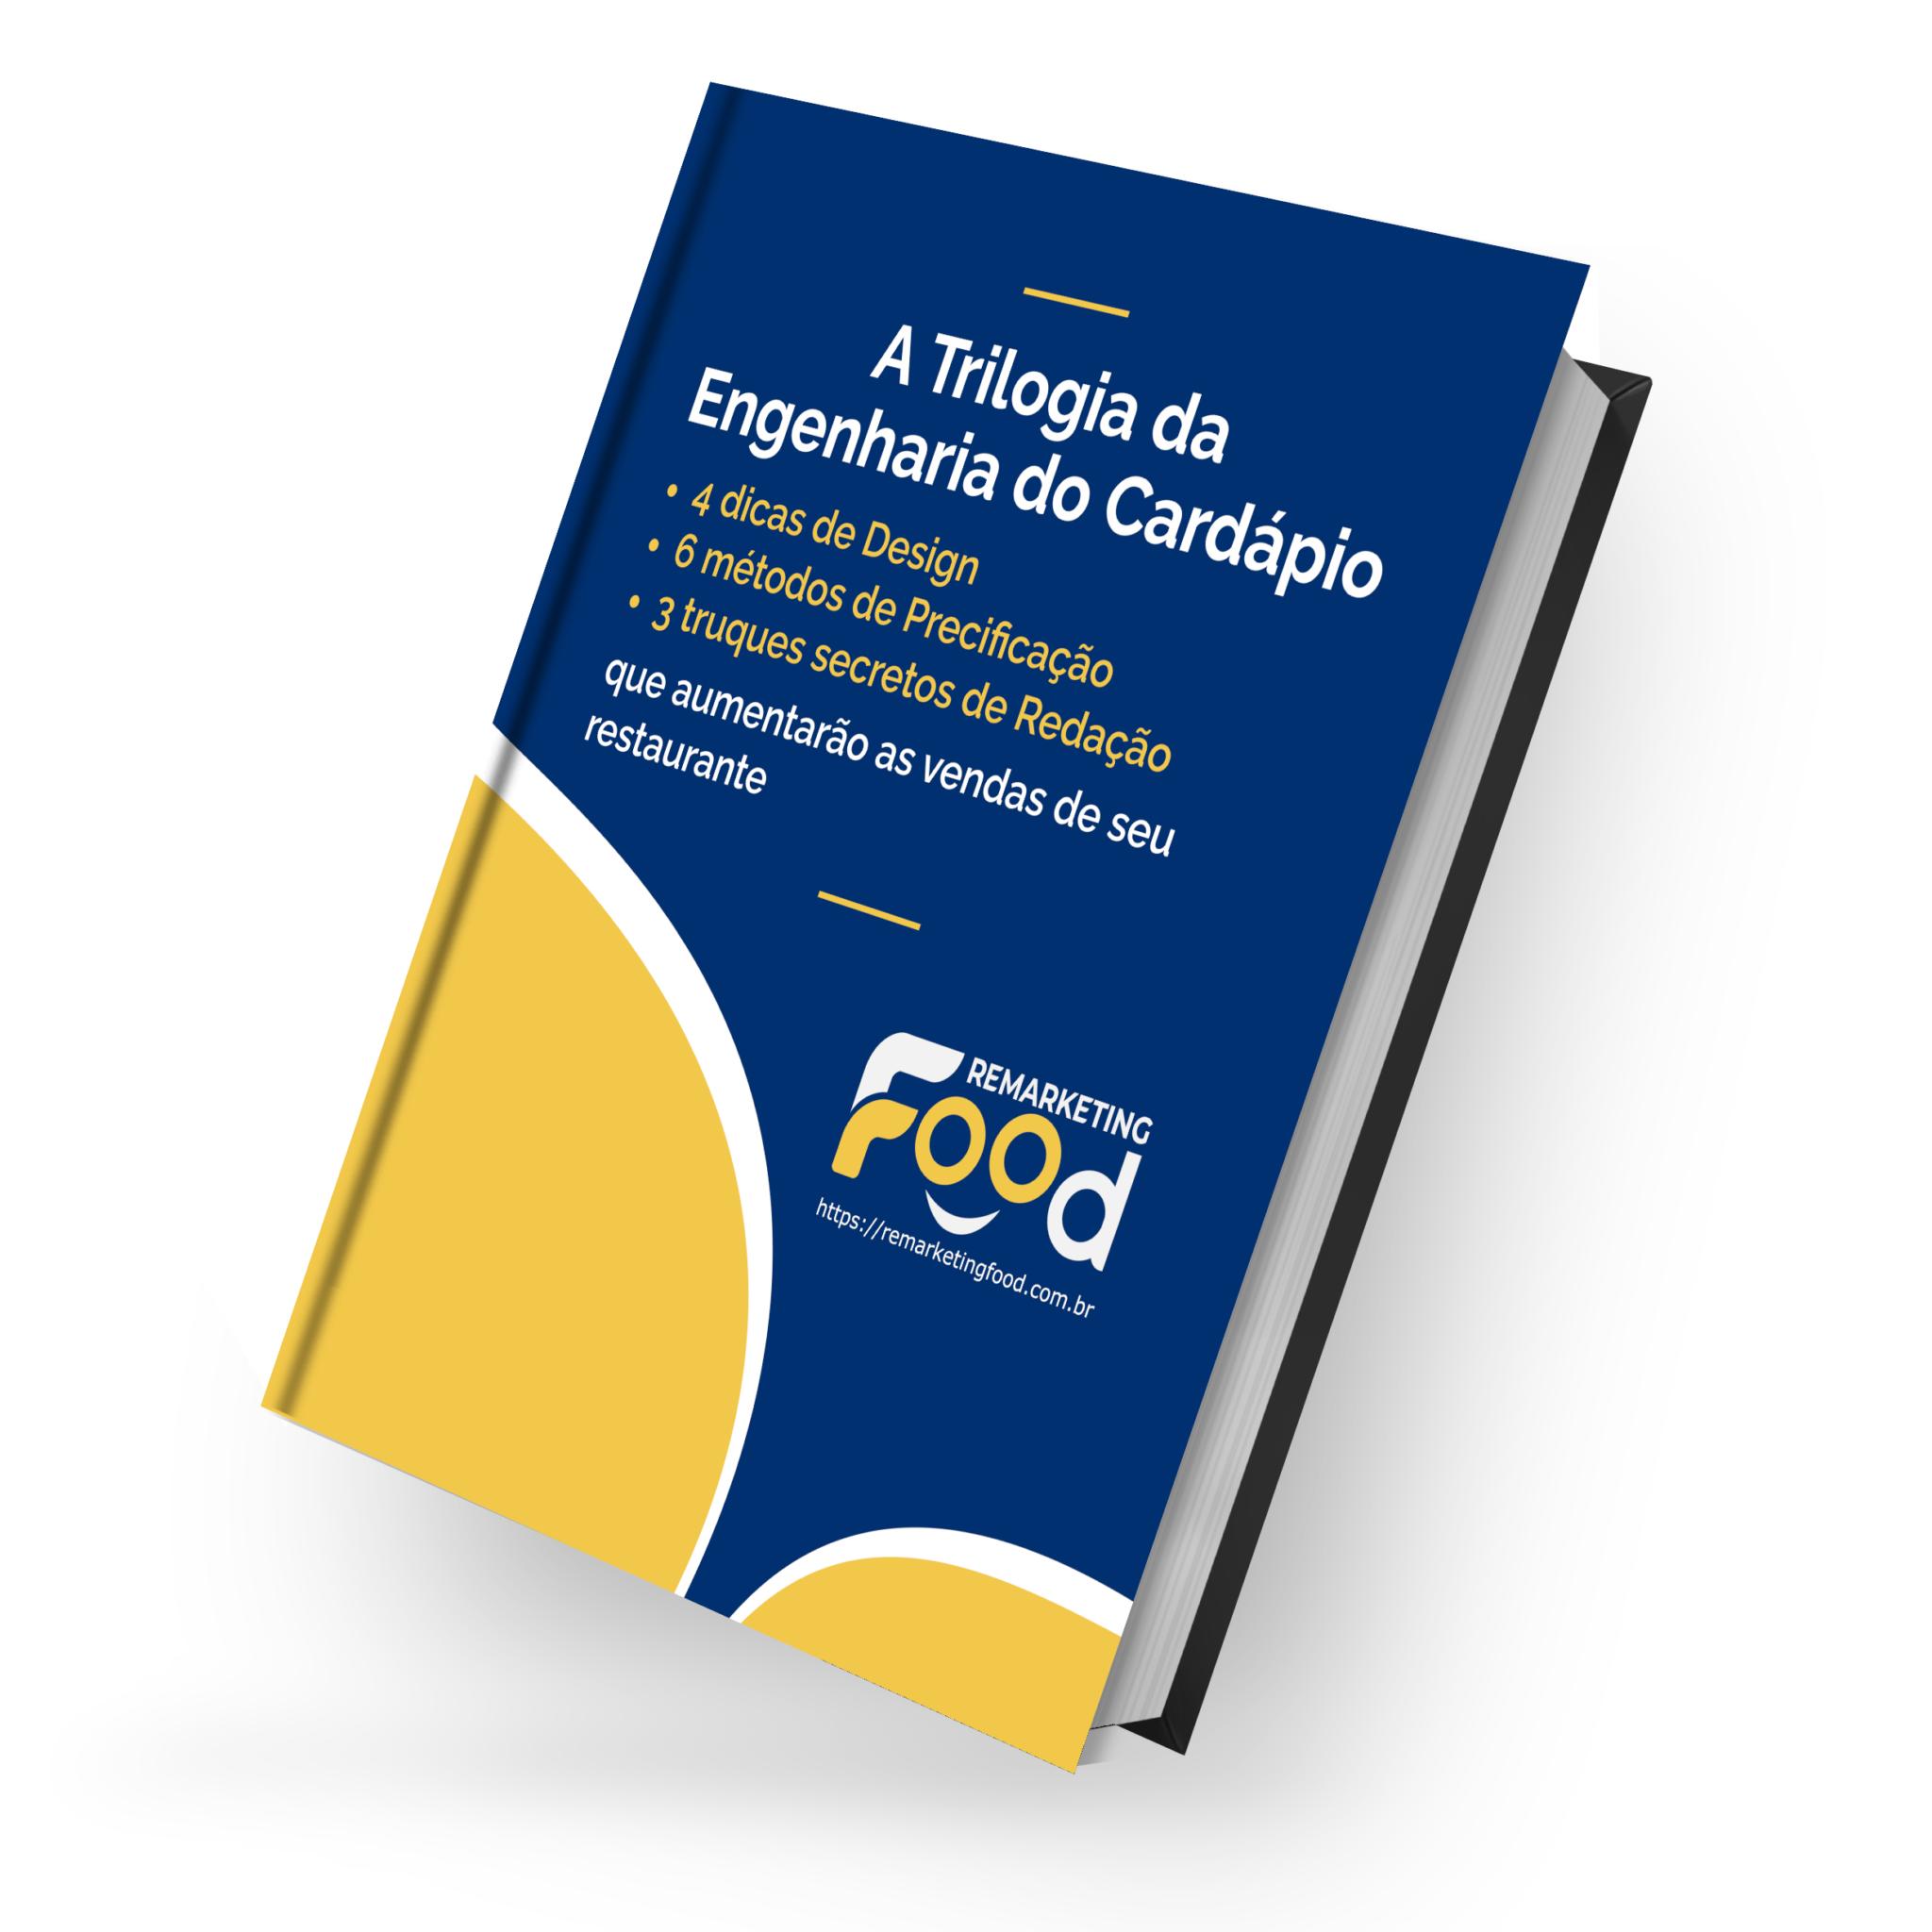 Remarketing Food - Ebook-Trilogia - (download)